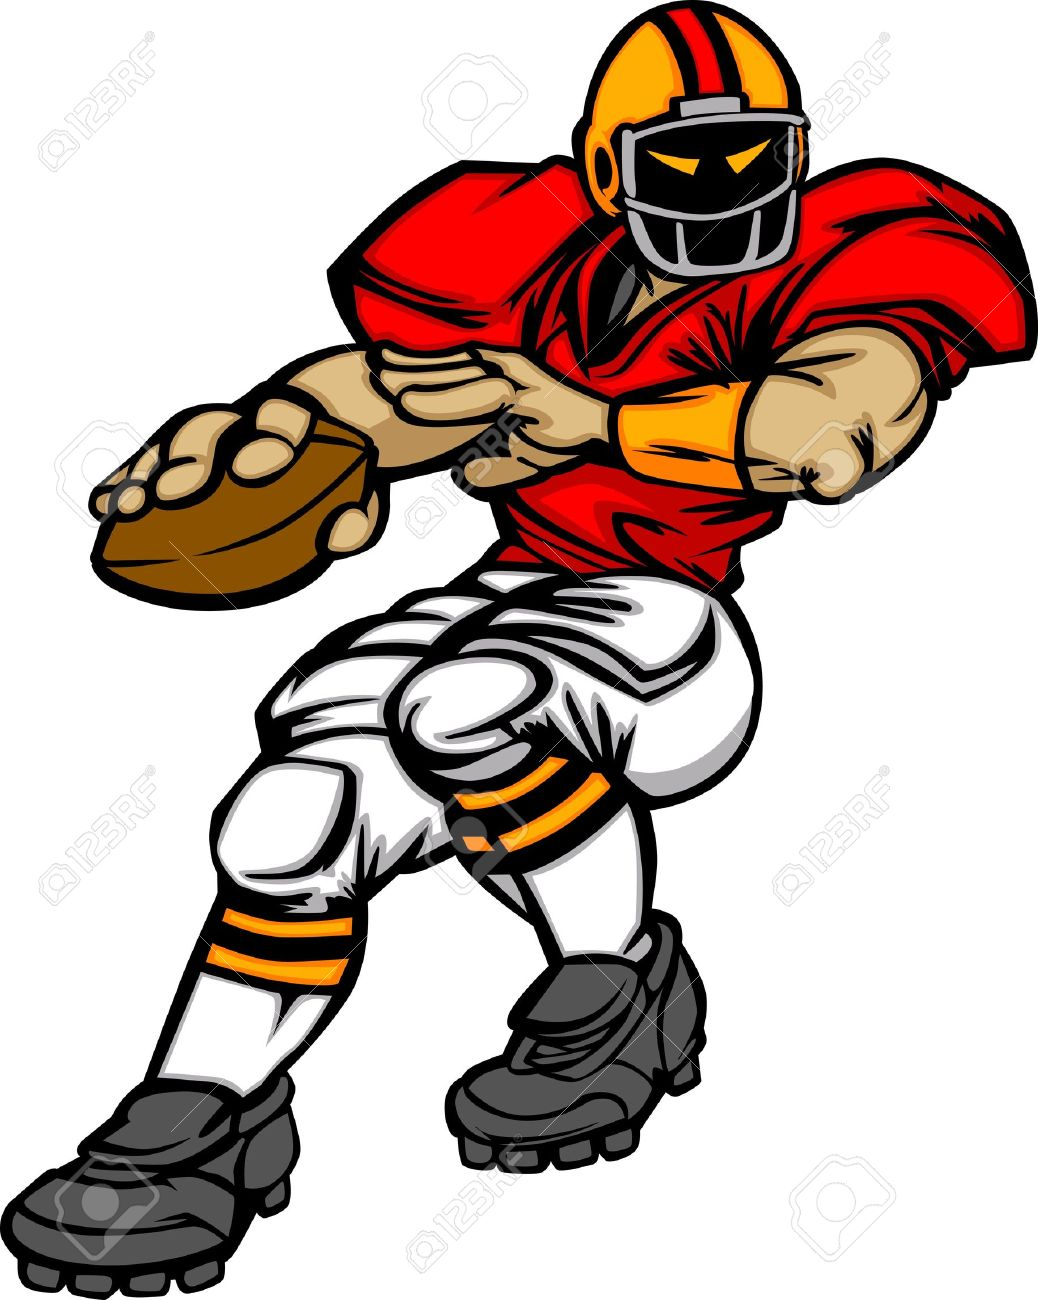 Cartoon Vector Silhouette Of A Cartoon Football Player Throwing